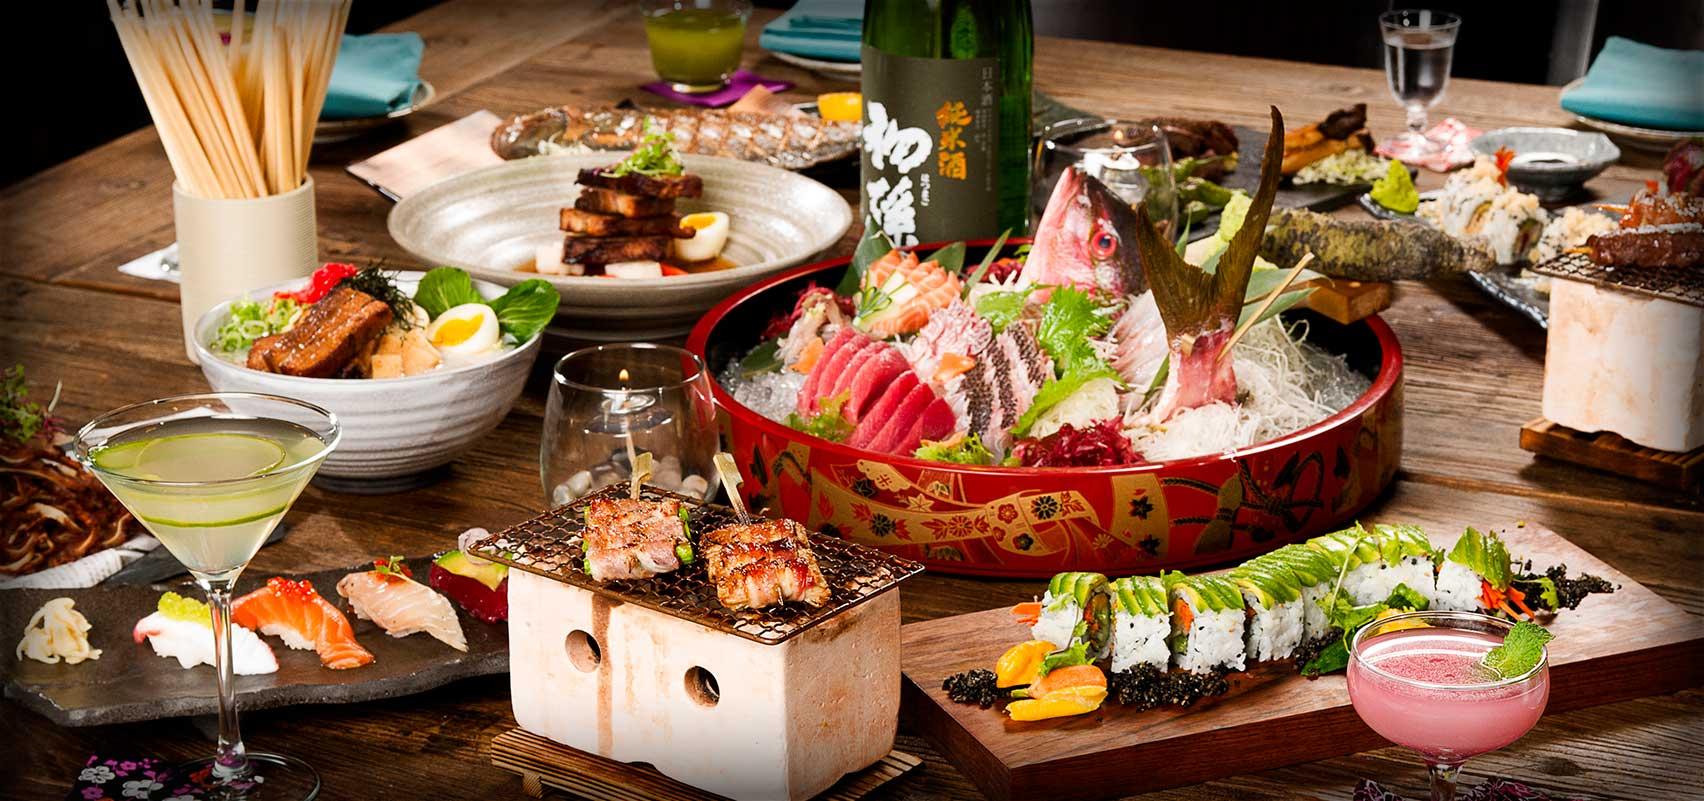 Table with Robata grilled items, sushi, sashimi, sake.